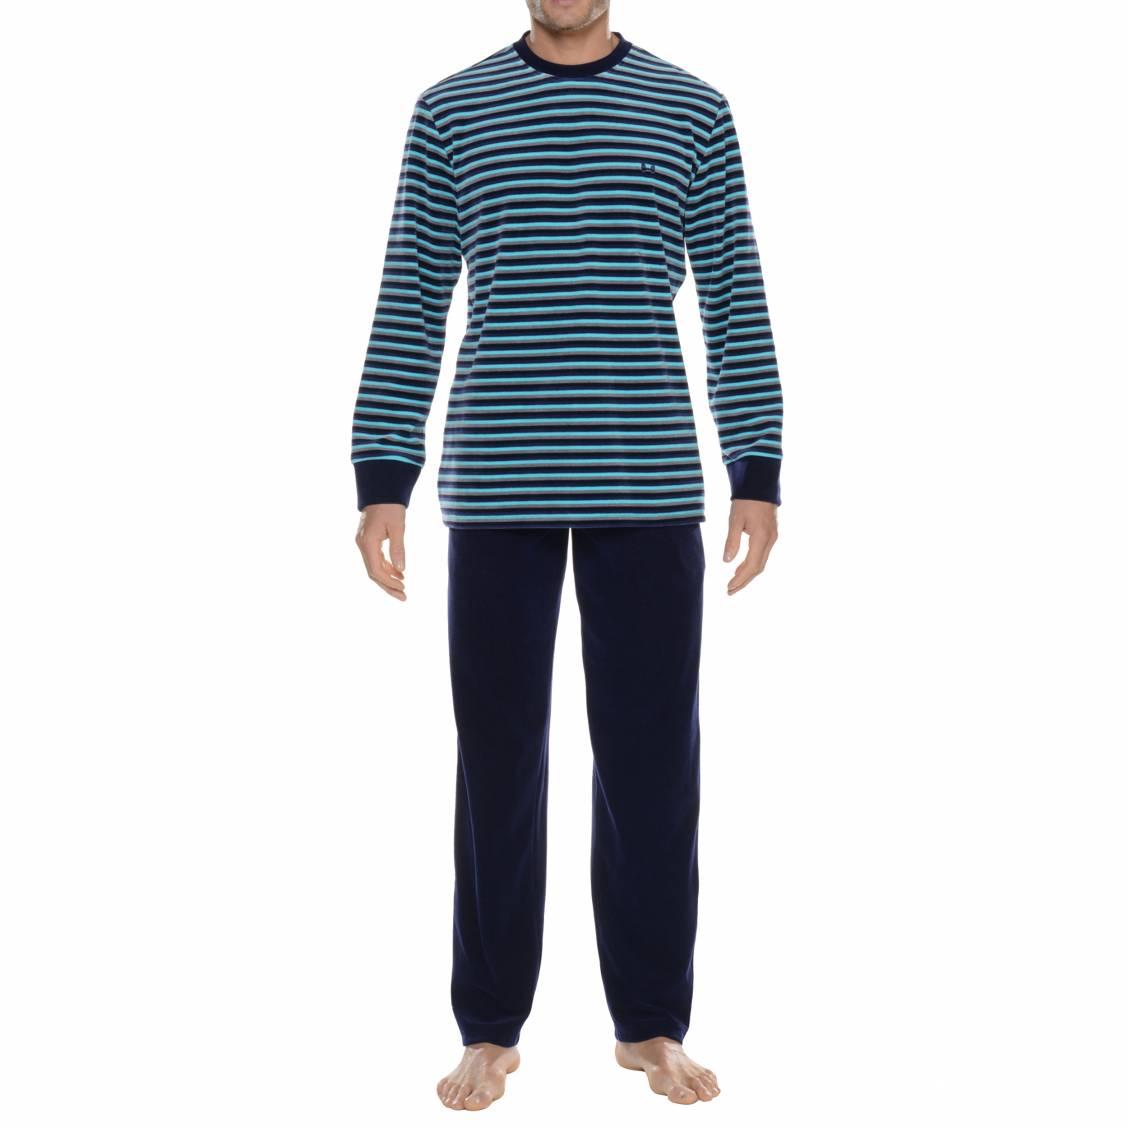 Pyjama chaud hom en velours rayures bleu marine et for Pyjama homme chaud